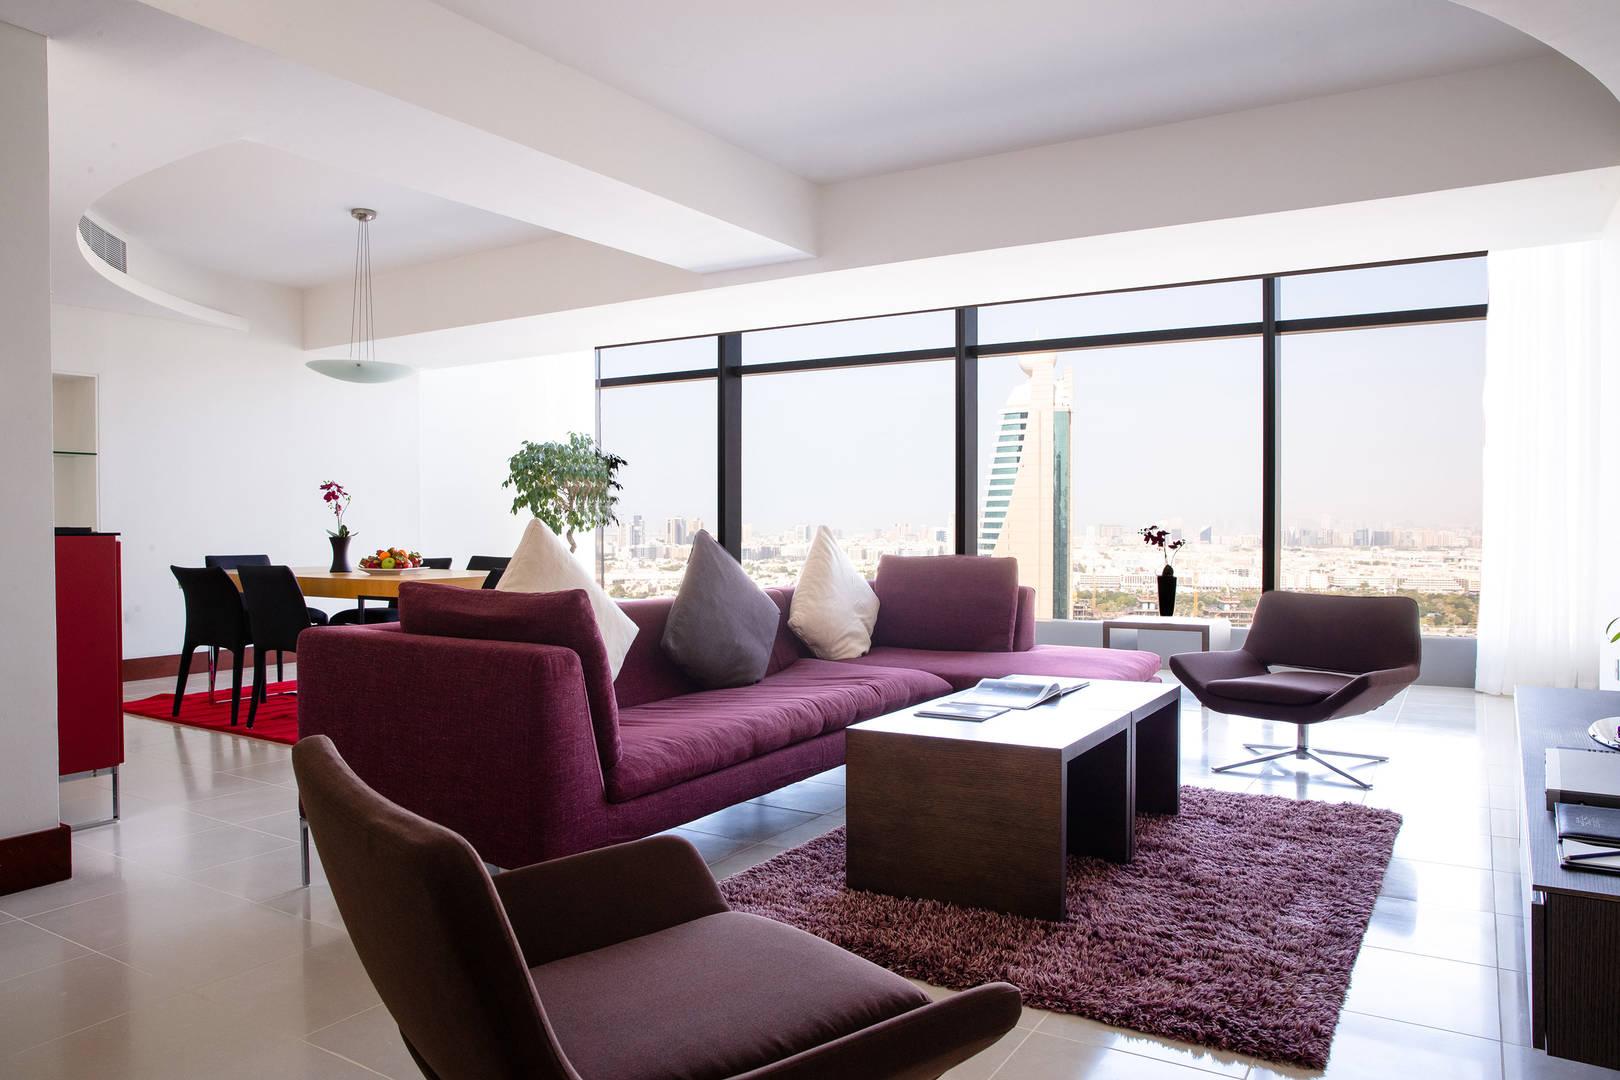 Interior of the Two Bedroom Duplex balcony living area